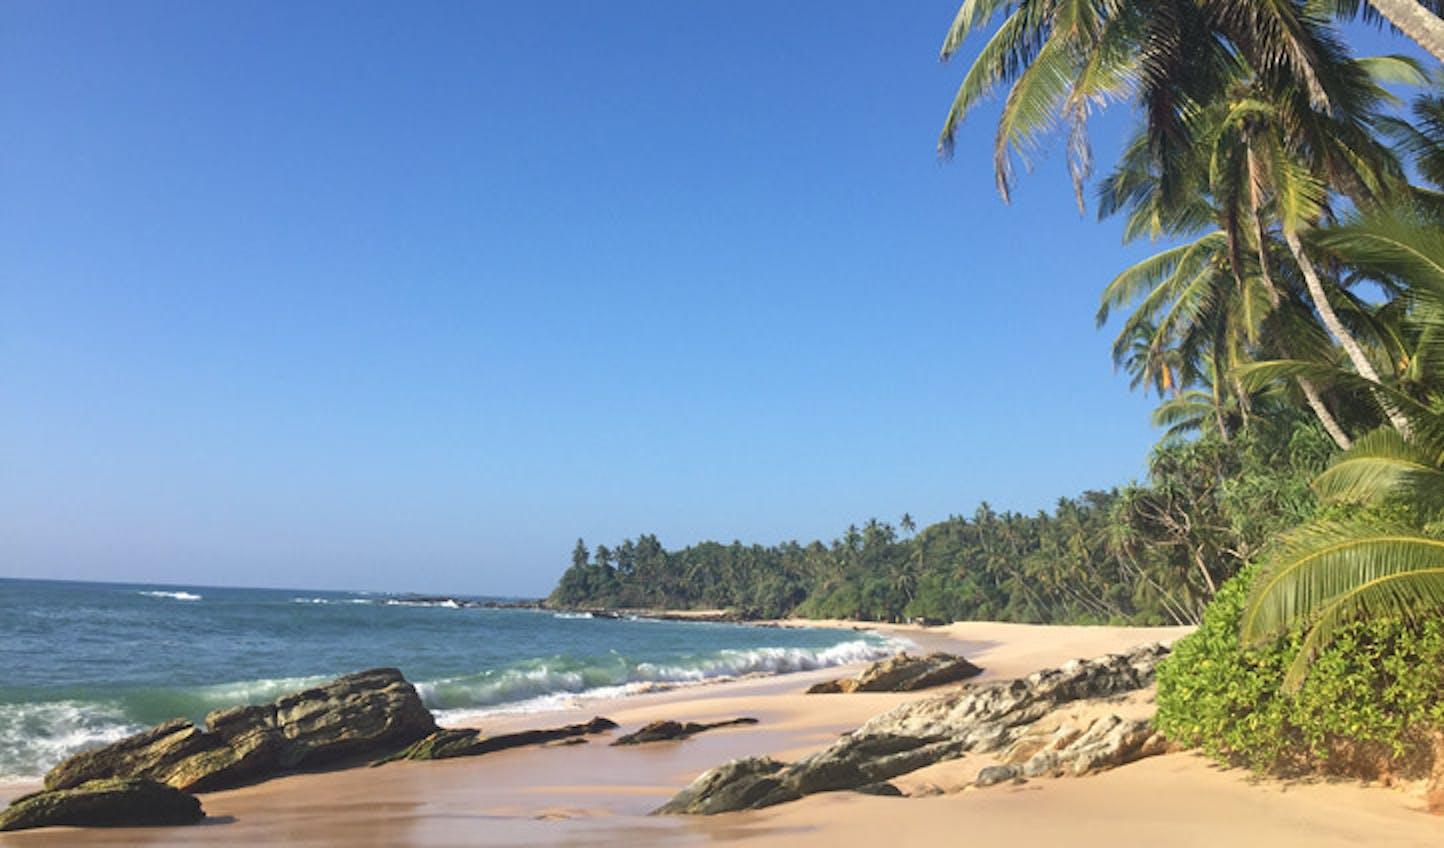 Beach views on Sri Lankas southern coast